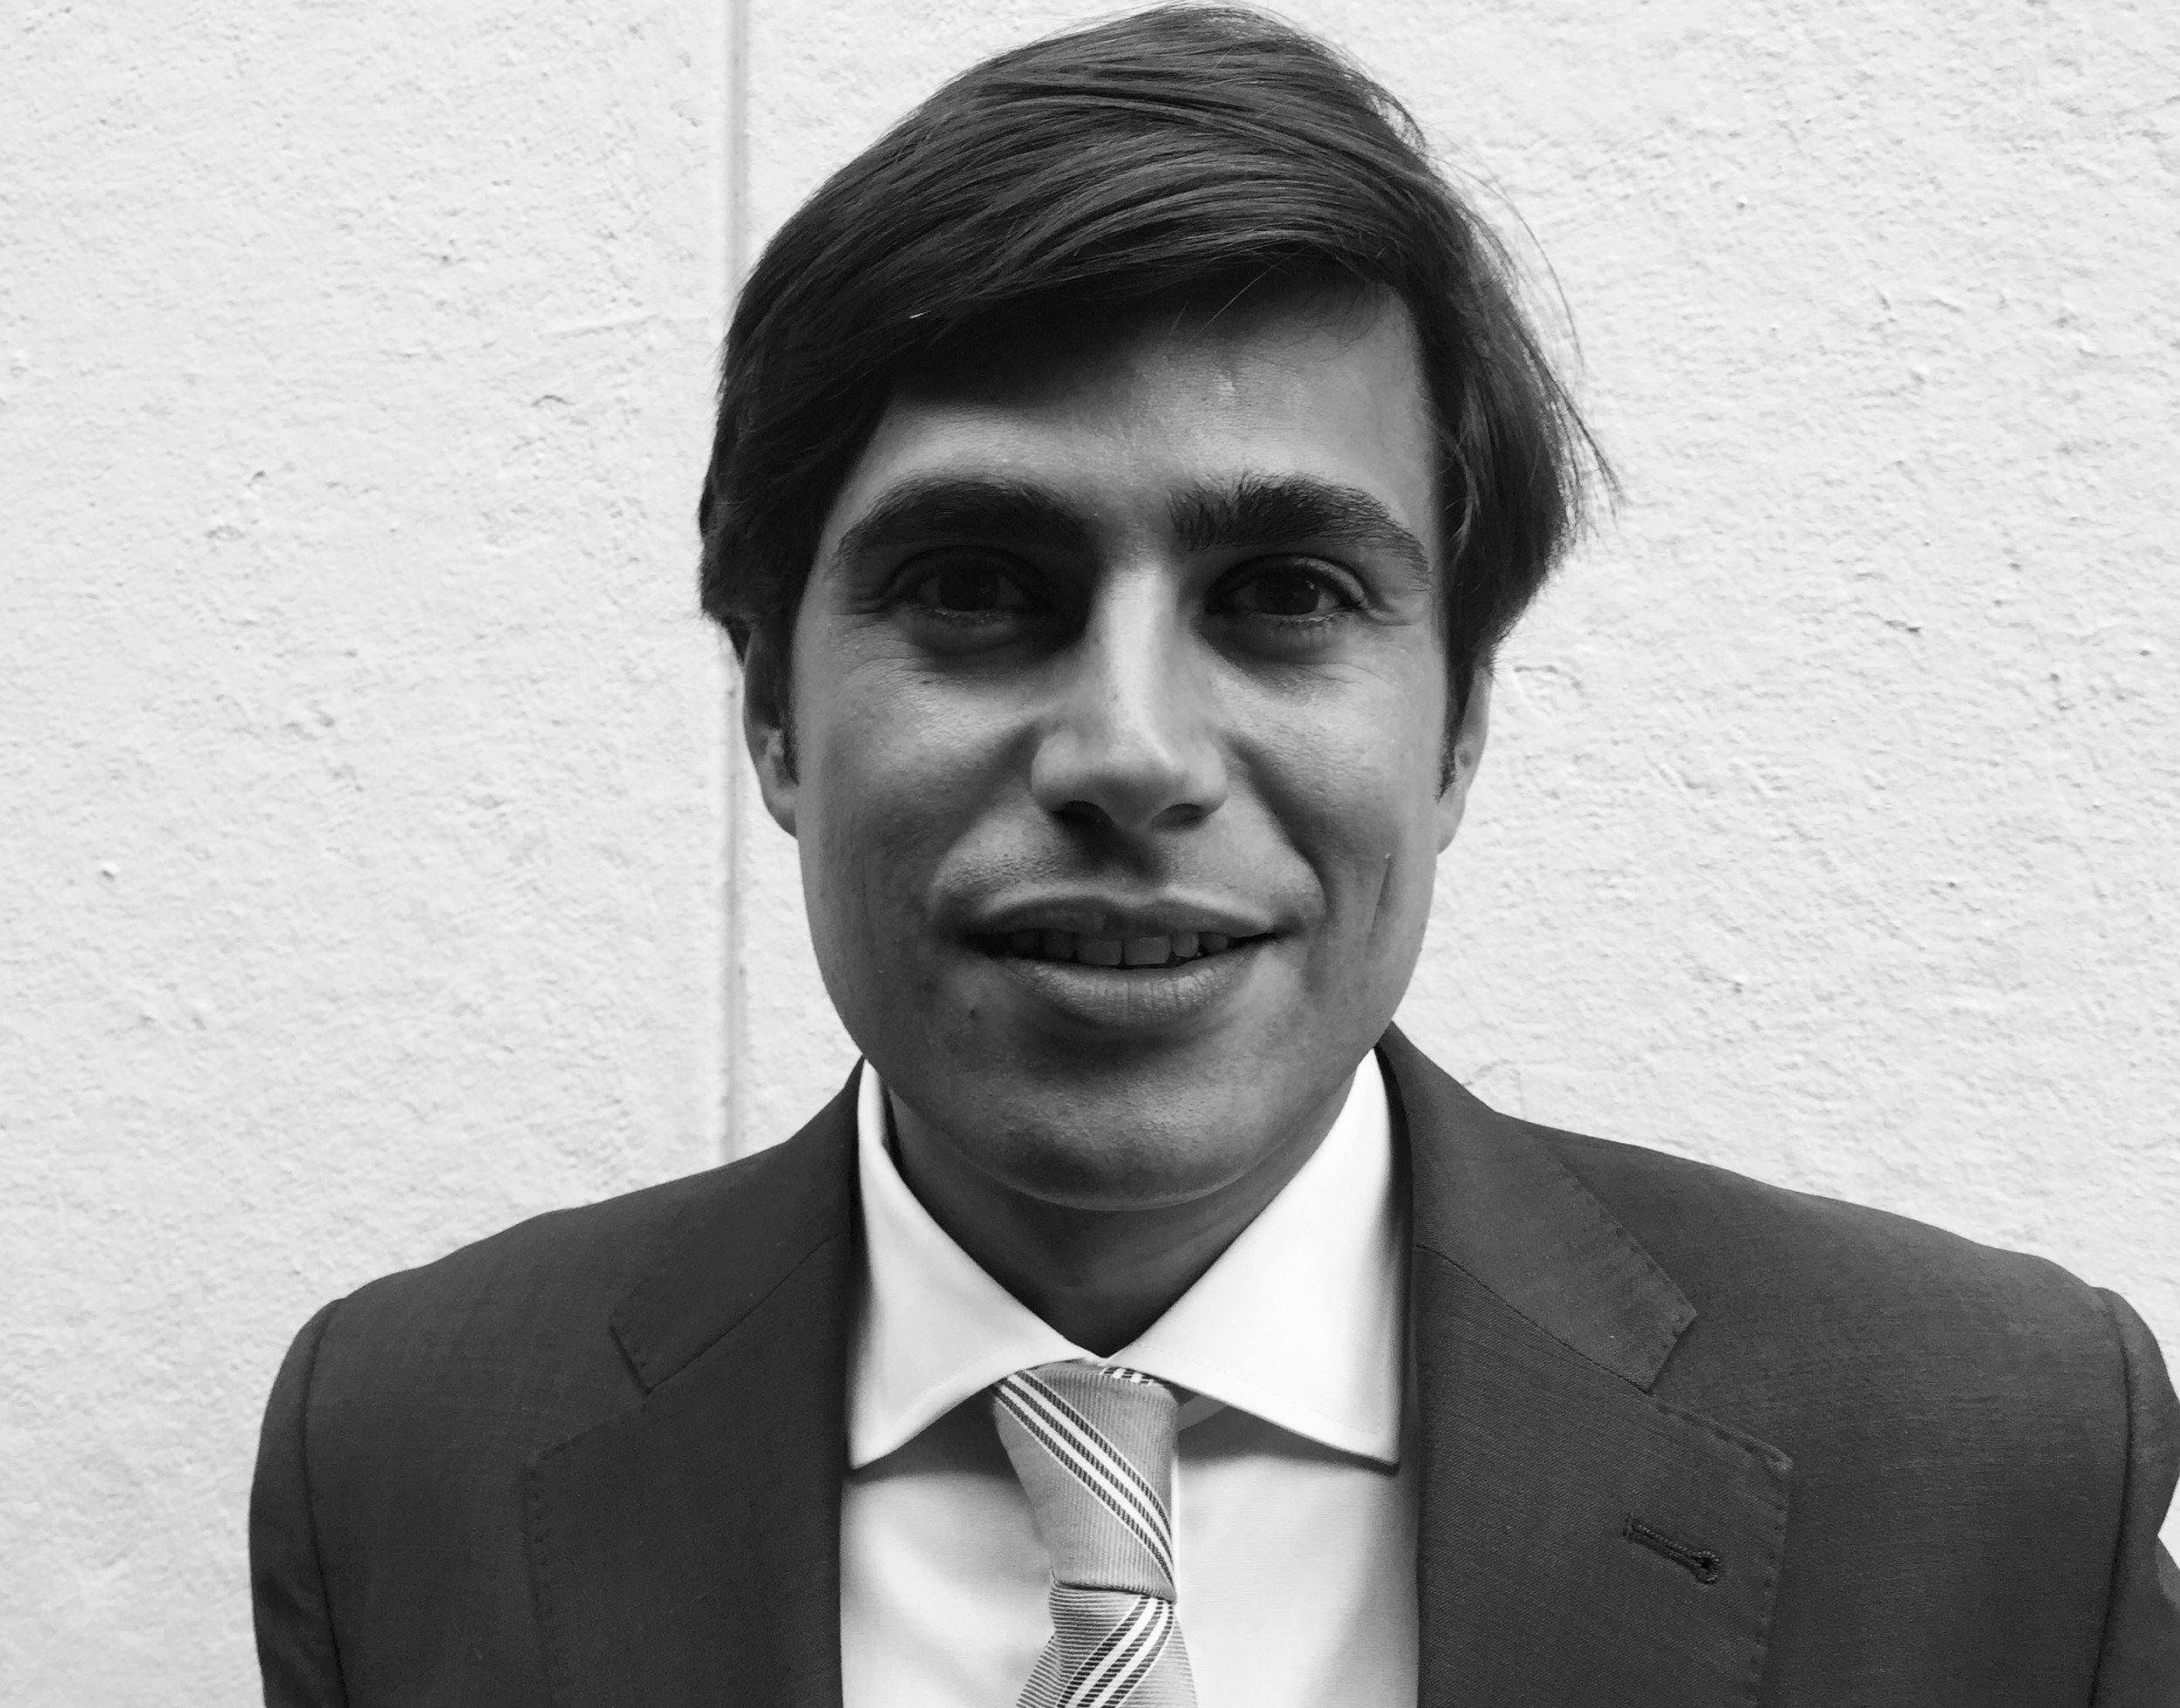 Álvaro Gajate Bonilla - ABOGADO MERCANTIL ZARAGOZATELÉFONO: 661 22 02 38EMAIL:alvarogajate@grupoalcazar.netOFICINA:C/ Joaquín Costa 3, Principal Derecha. 50001 Zaragoza